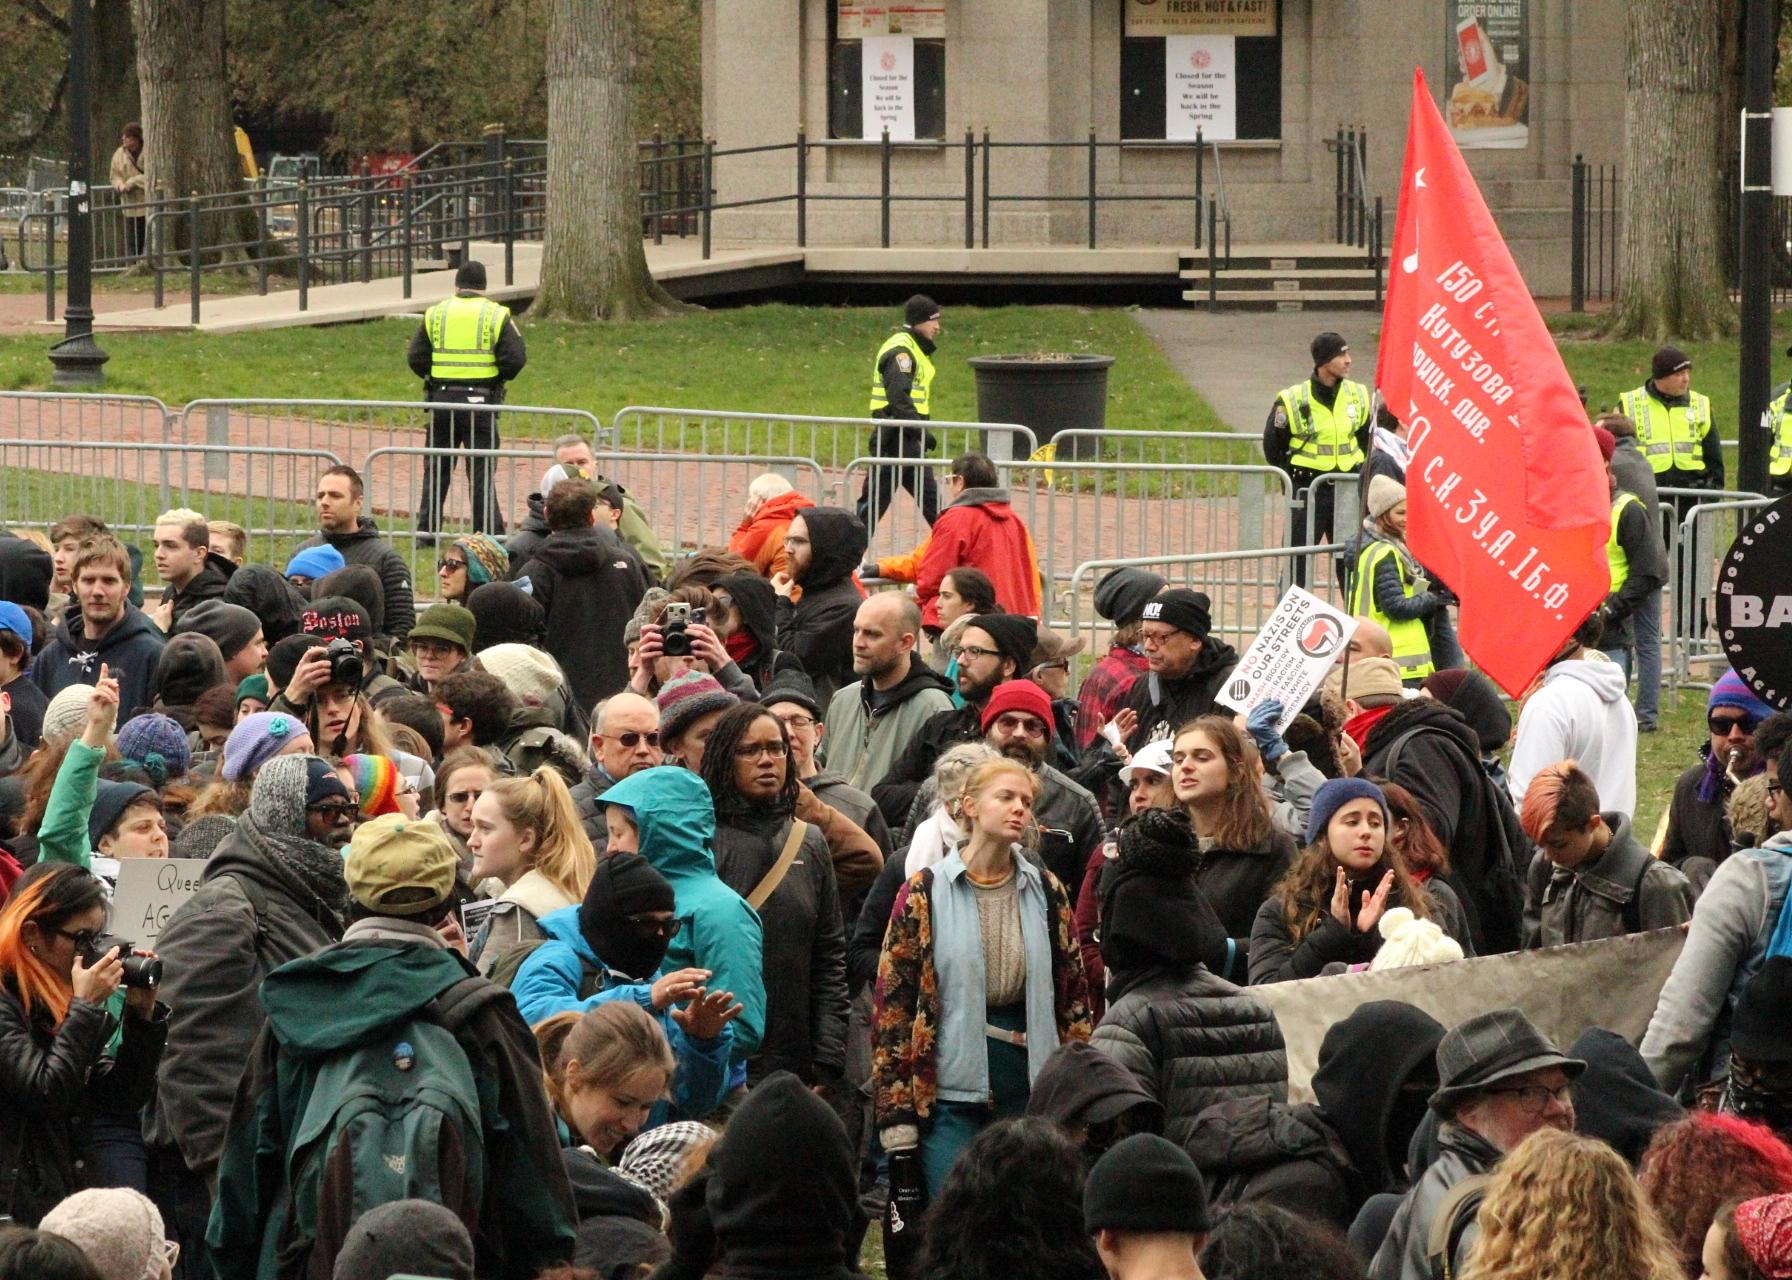 2017-11-18 Boston Common Free Speech Rally 16